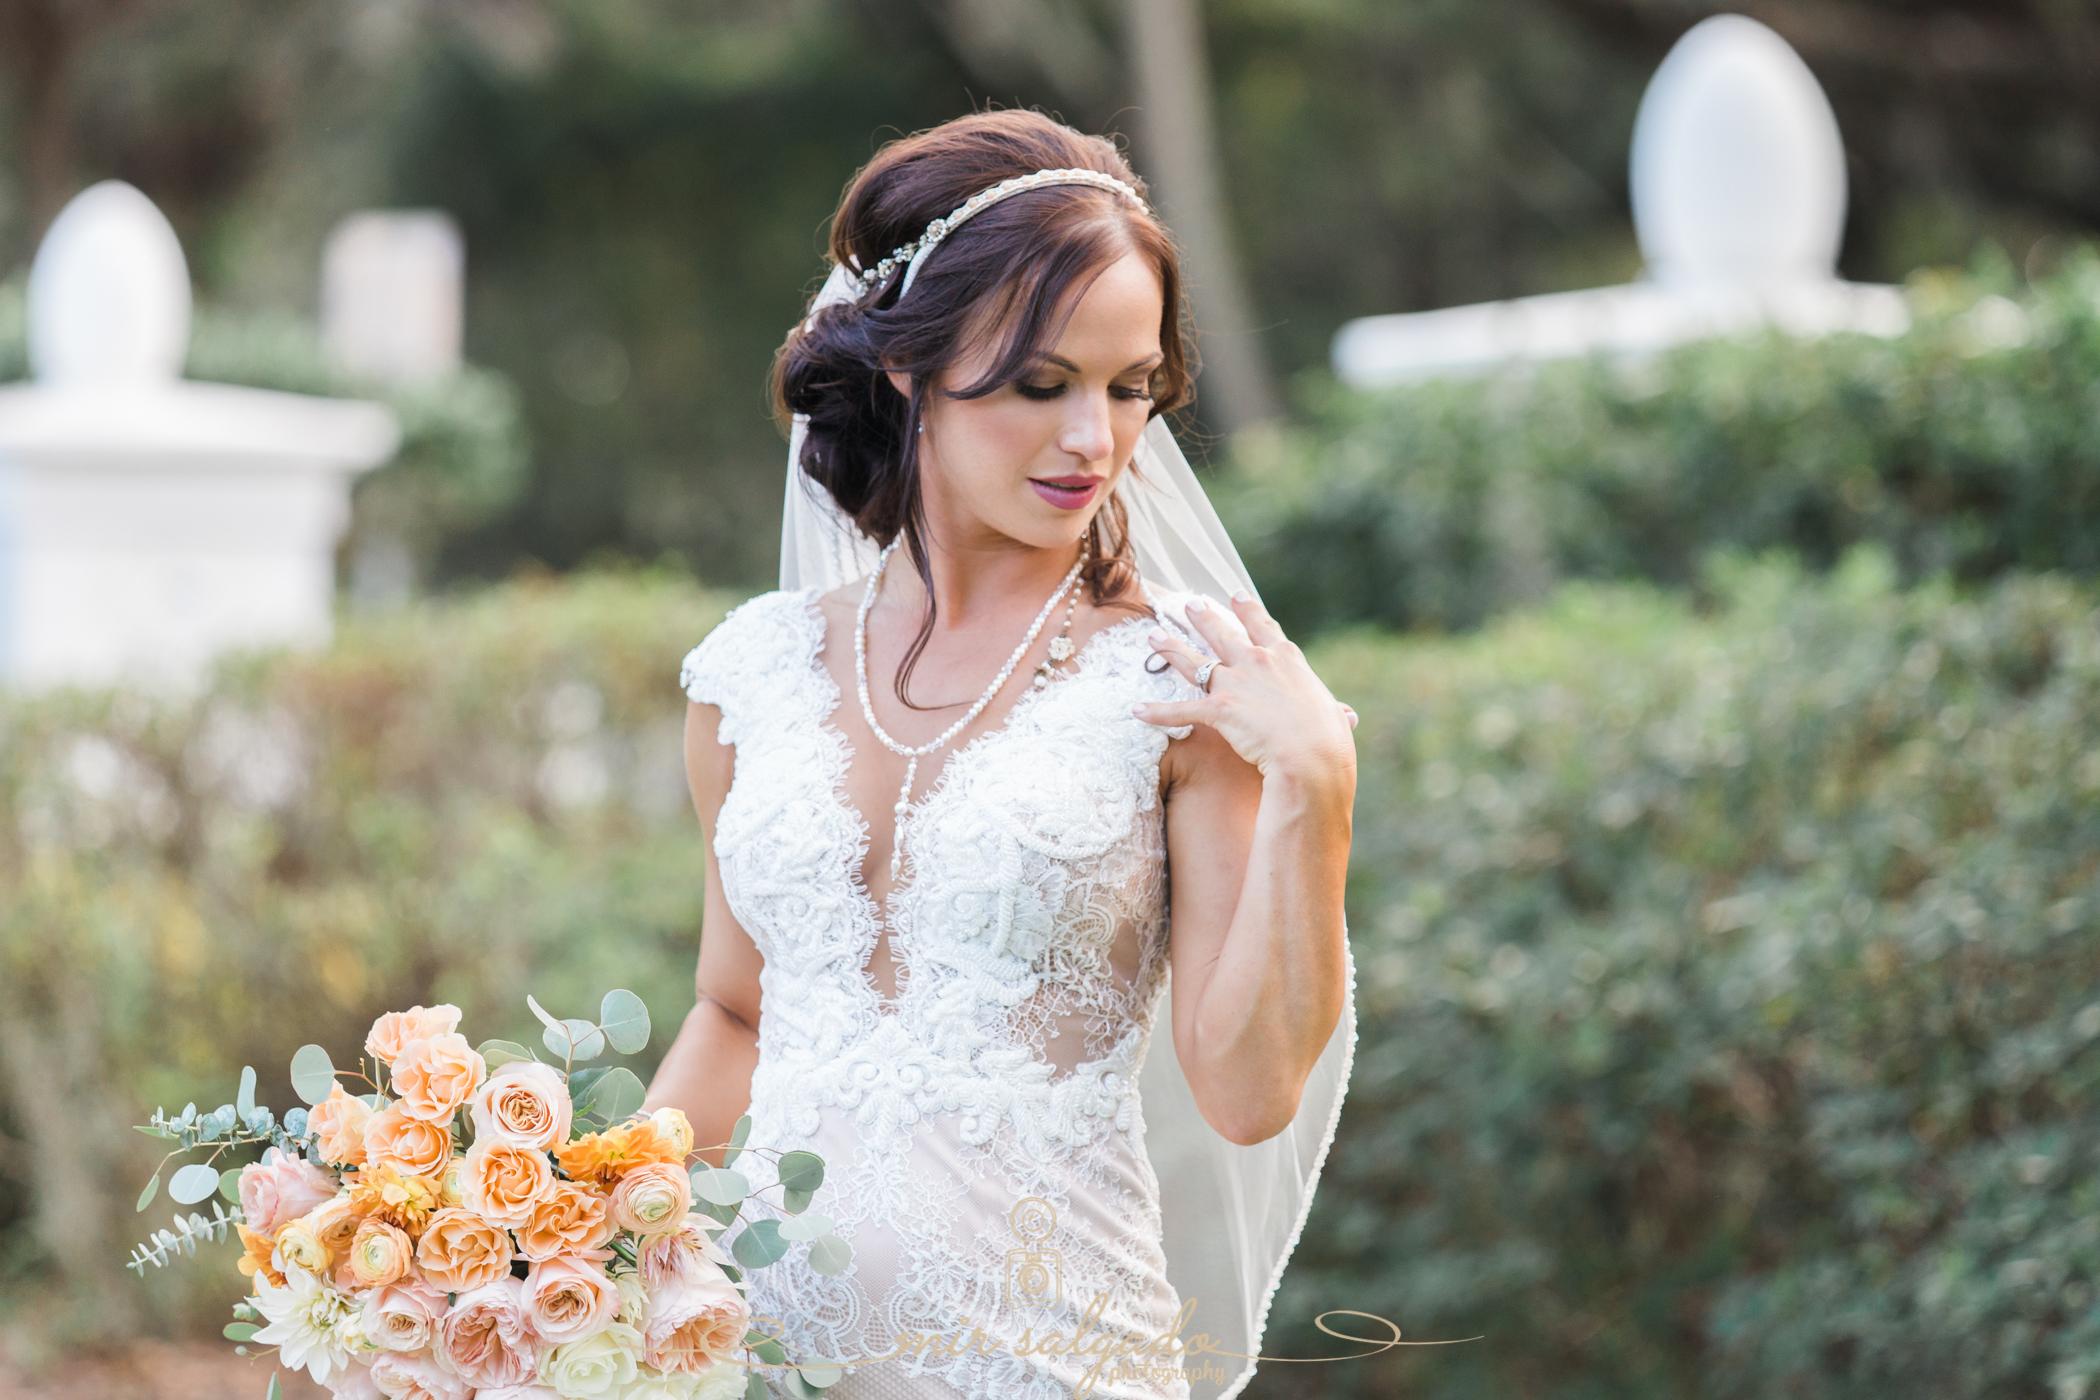 Tampa-bride-photo, Tampa-yacht-club-wedding